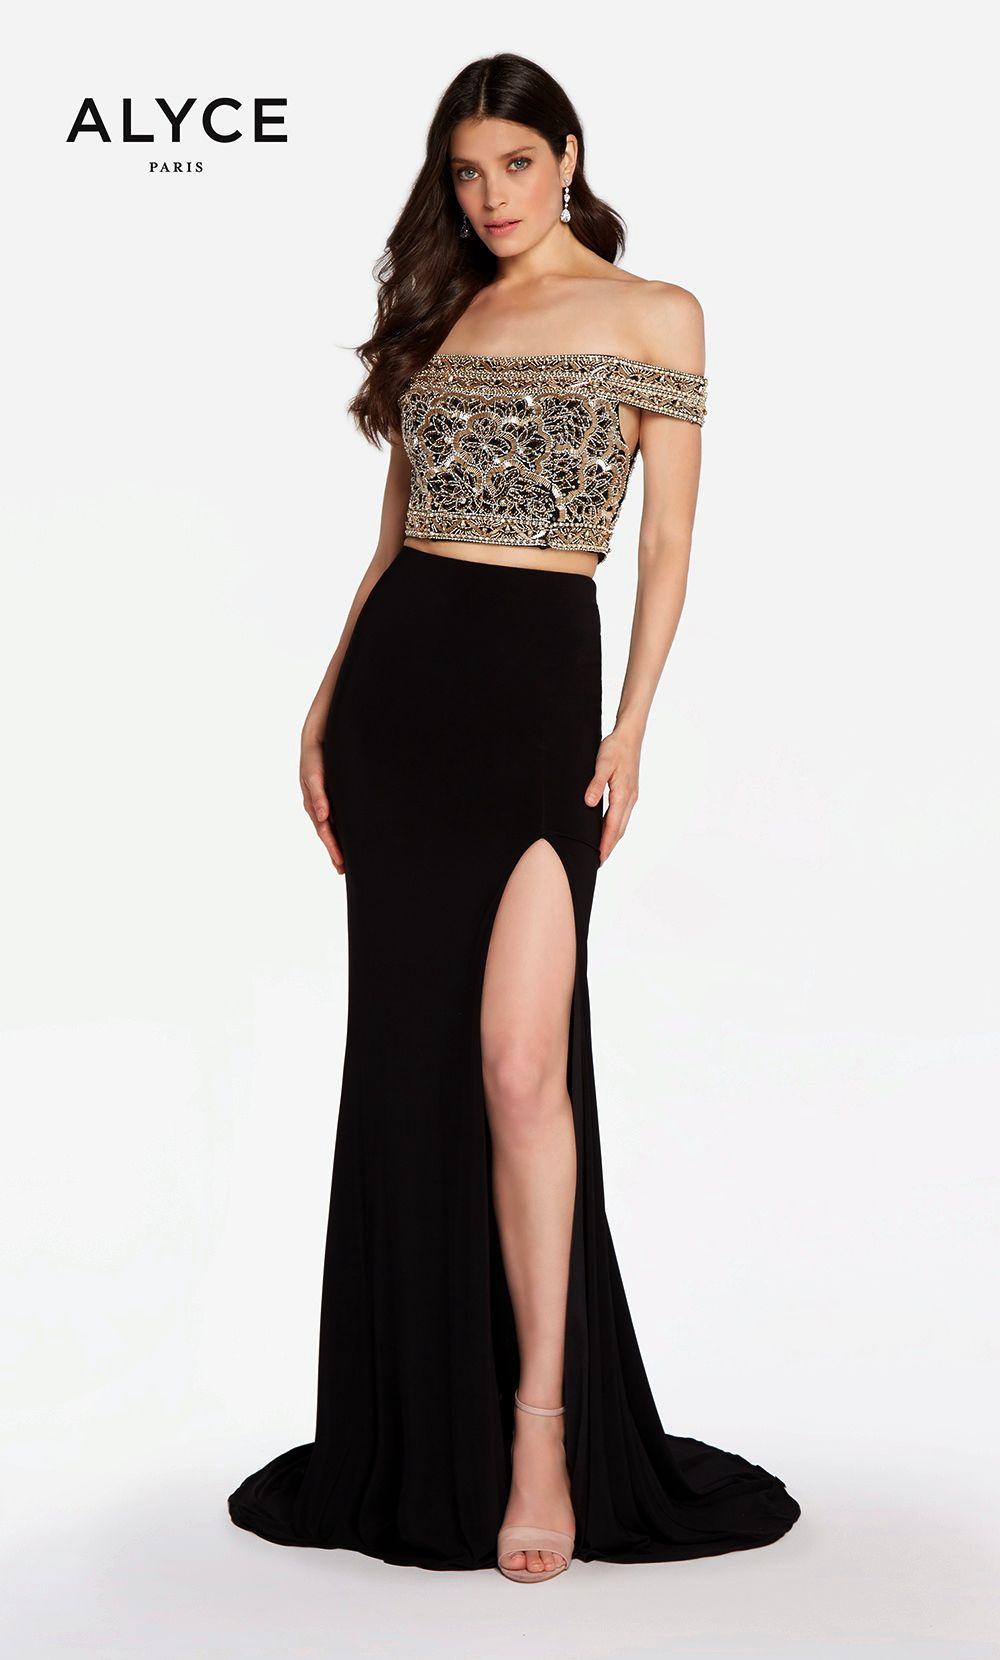 Prom dresses evening dresses by alyce parisucbrueaayucbruelong two